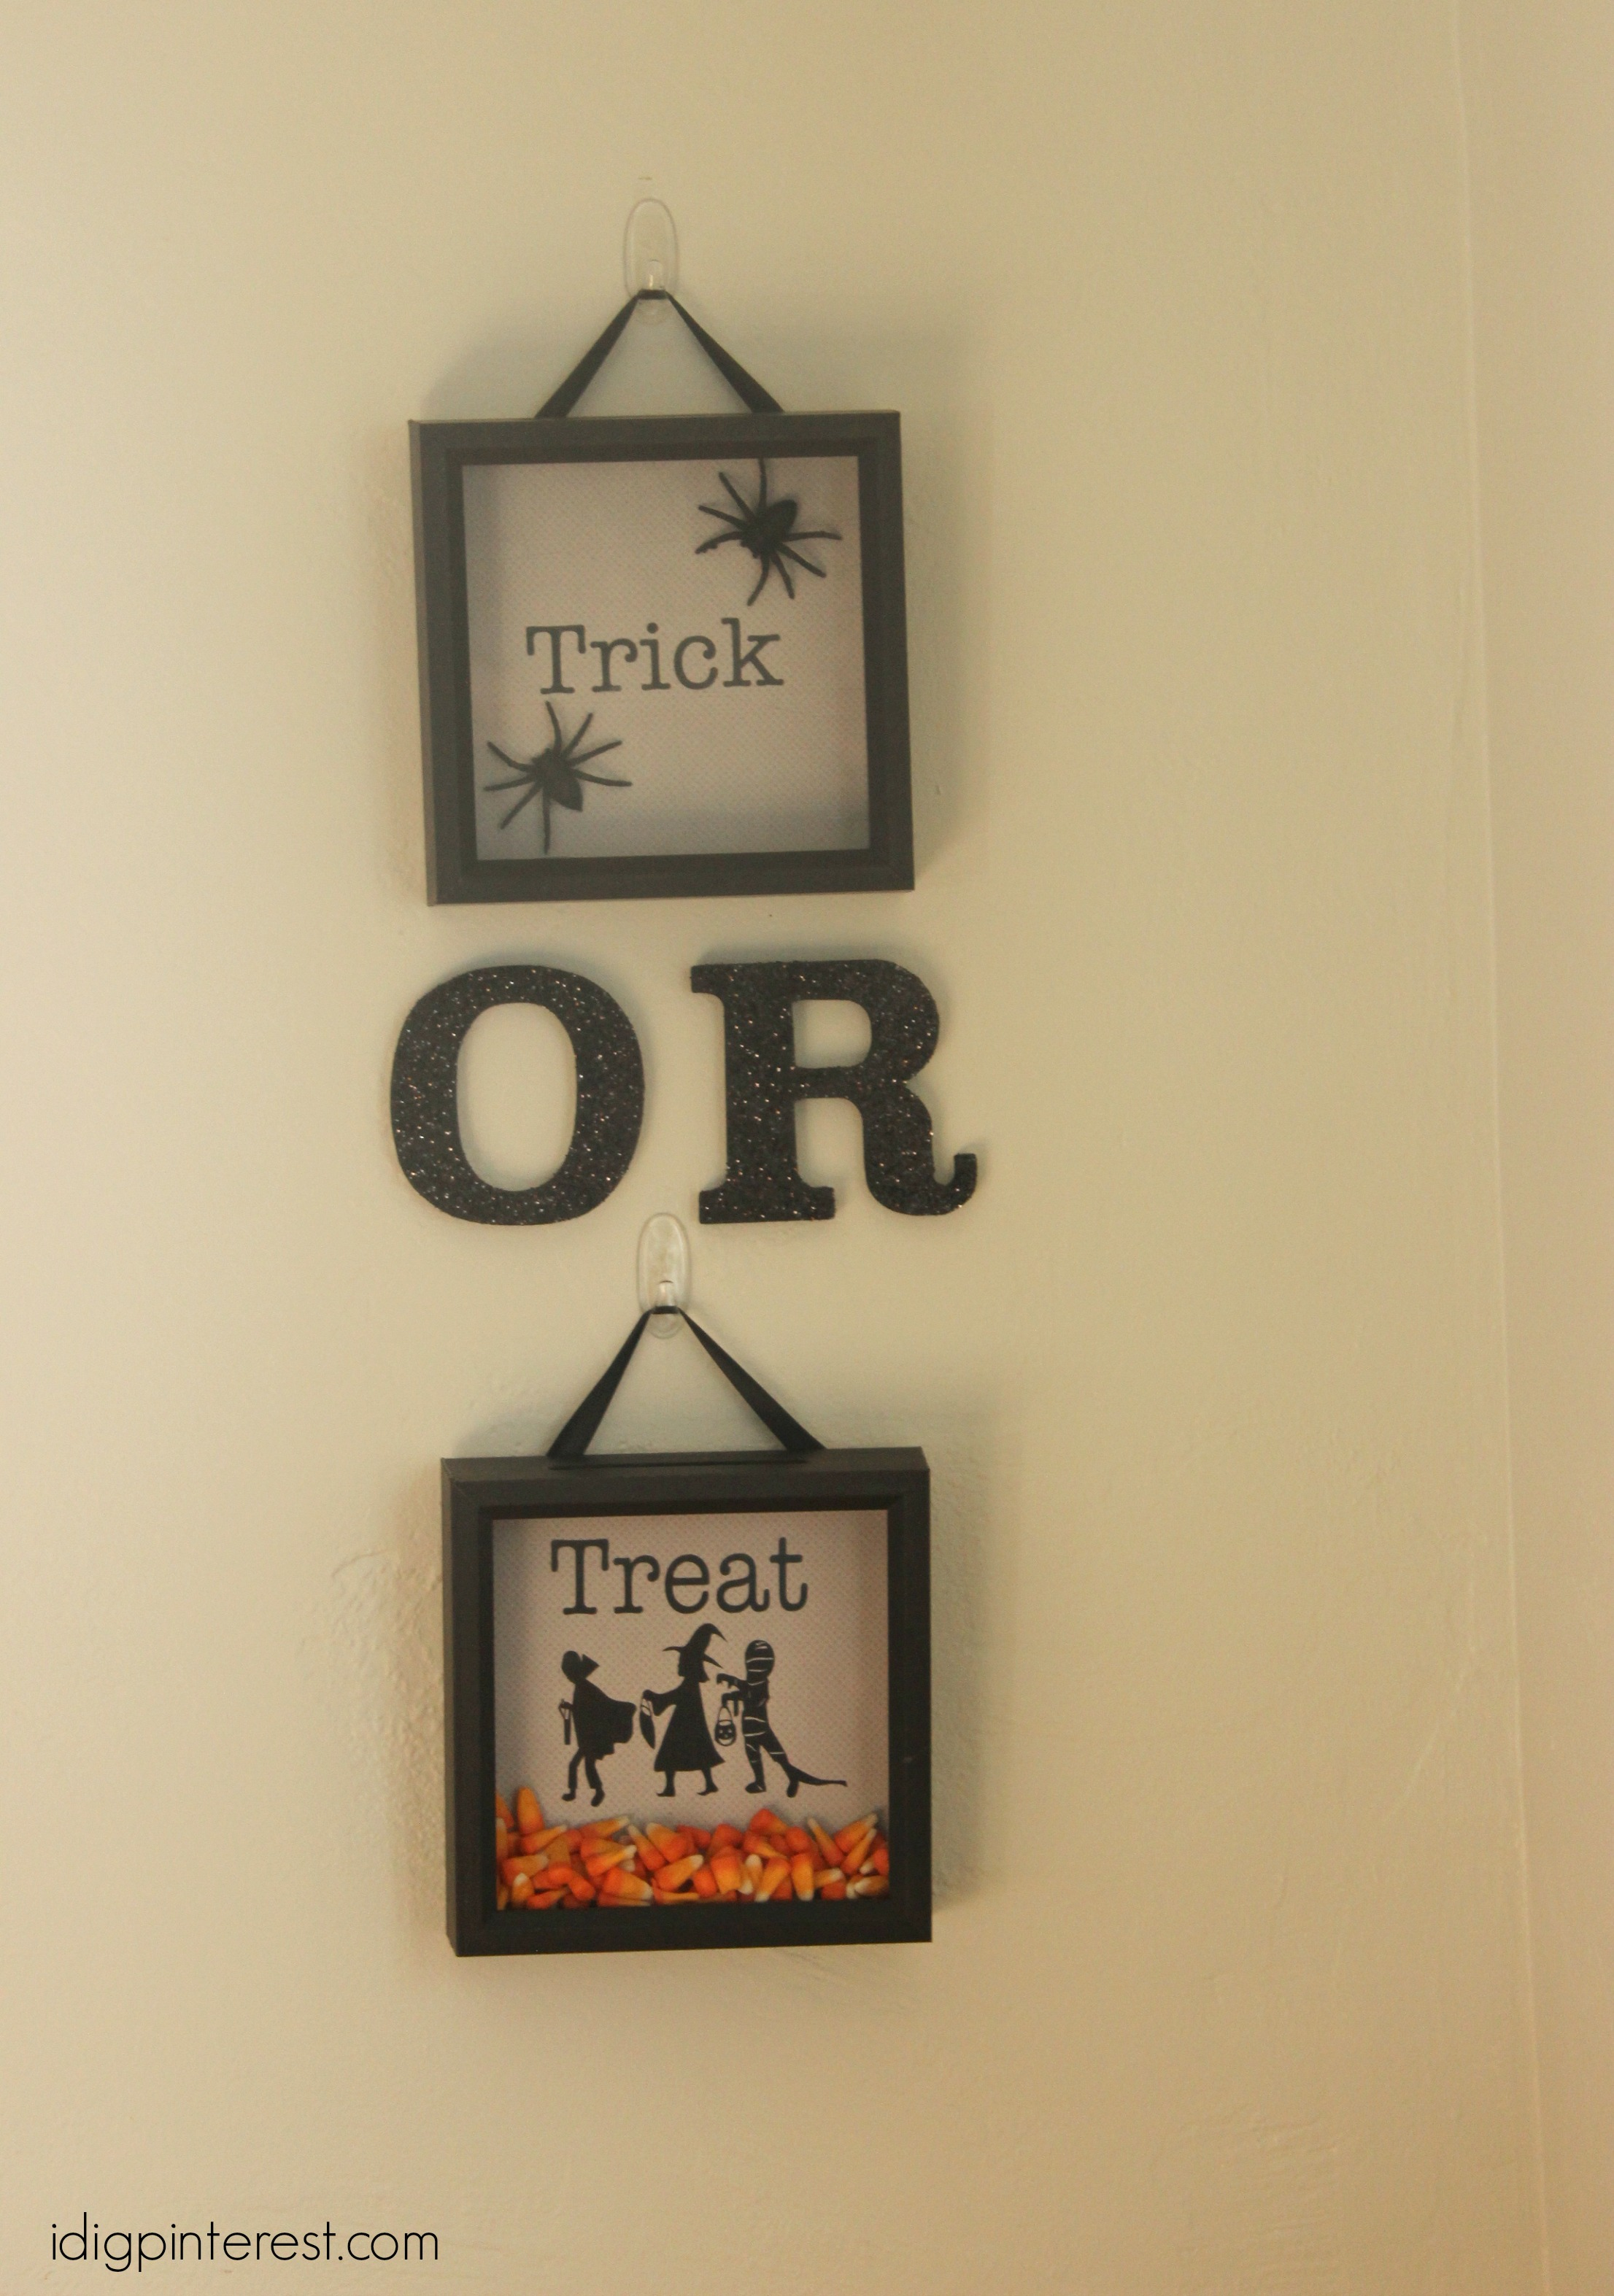 Trick Or Treat Shadow Box Wall Decor I Dig Pinterest